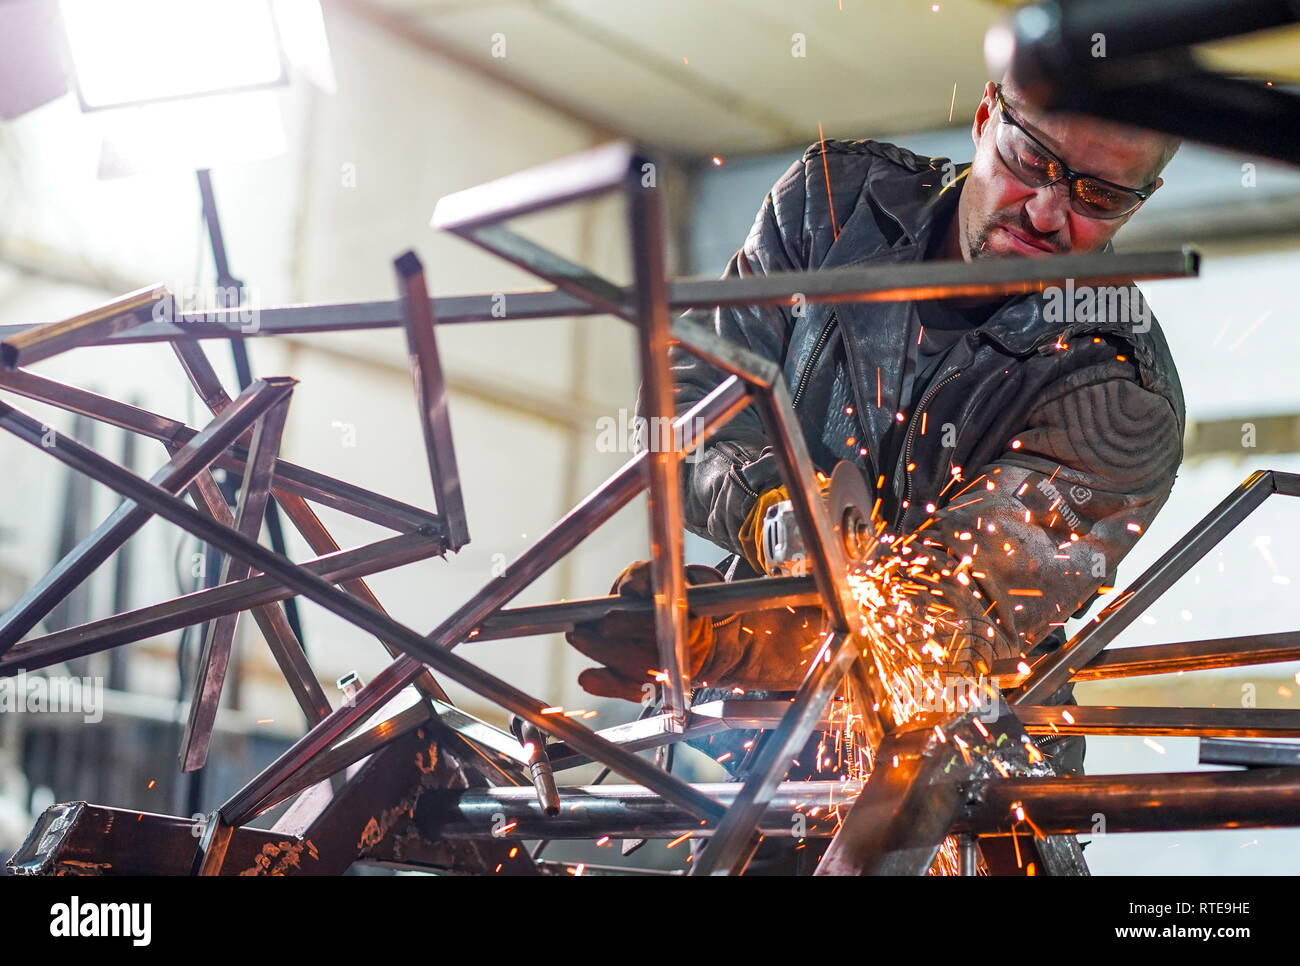 Irkutsk, Russia. 21st Feb, 2019. IRKUTSK, RUSSIA - FEBRUARY 21, 2019: Car mechanic Roman Nikitin is tuning a car in his workshop; Roman Nikitin custom tunes cars and motorcycles in the post apocalyptic style. Alyona Shatuyeva/TASS Credit: ITAR-TASS News Agency/Alamy Live News - Stock Image